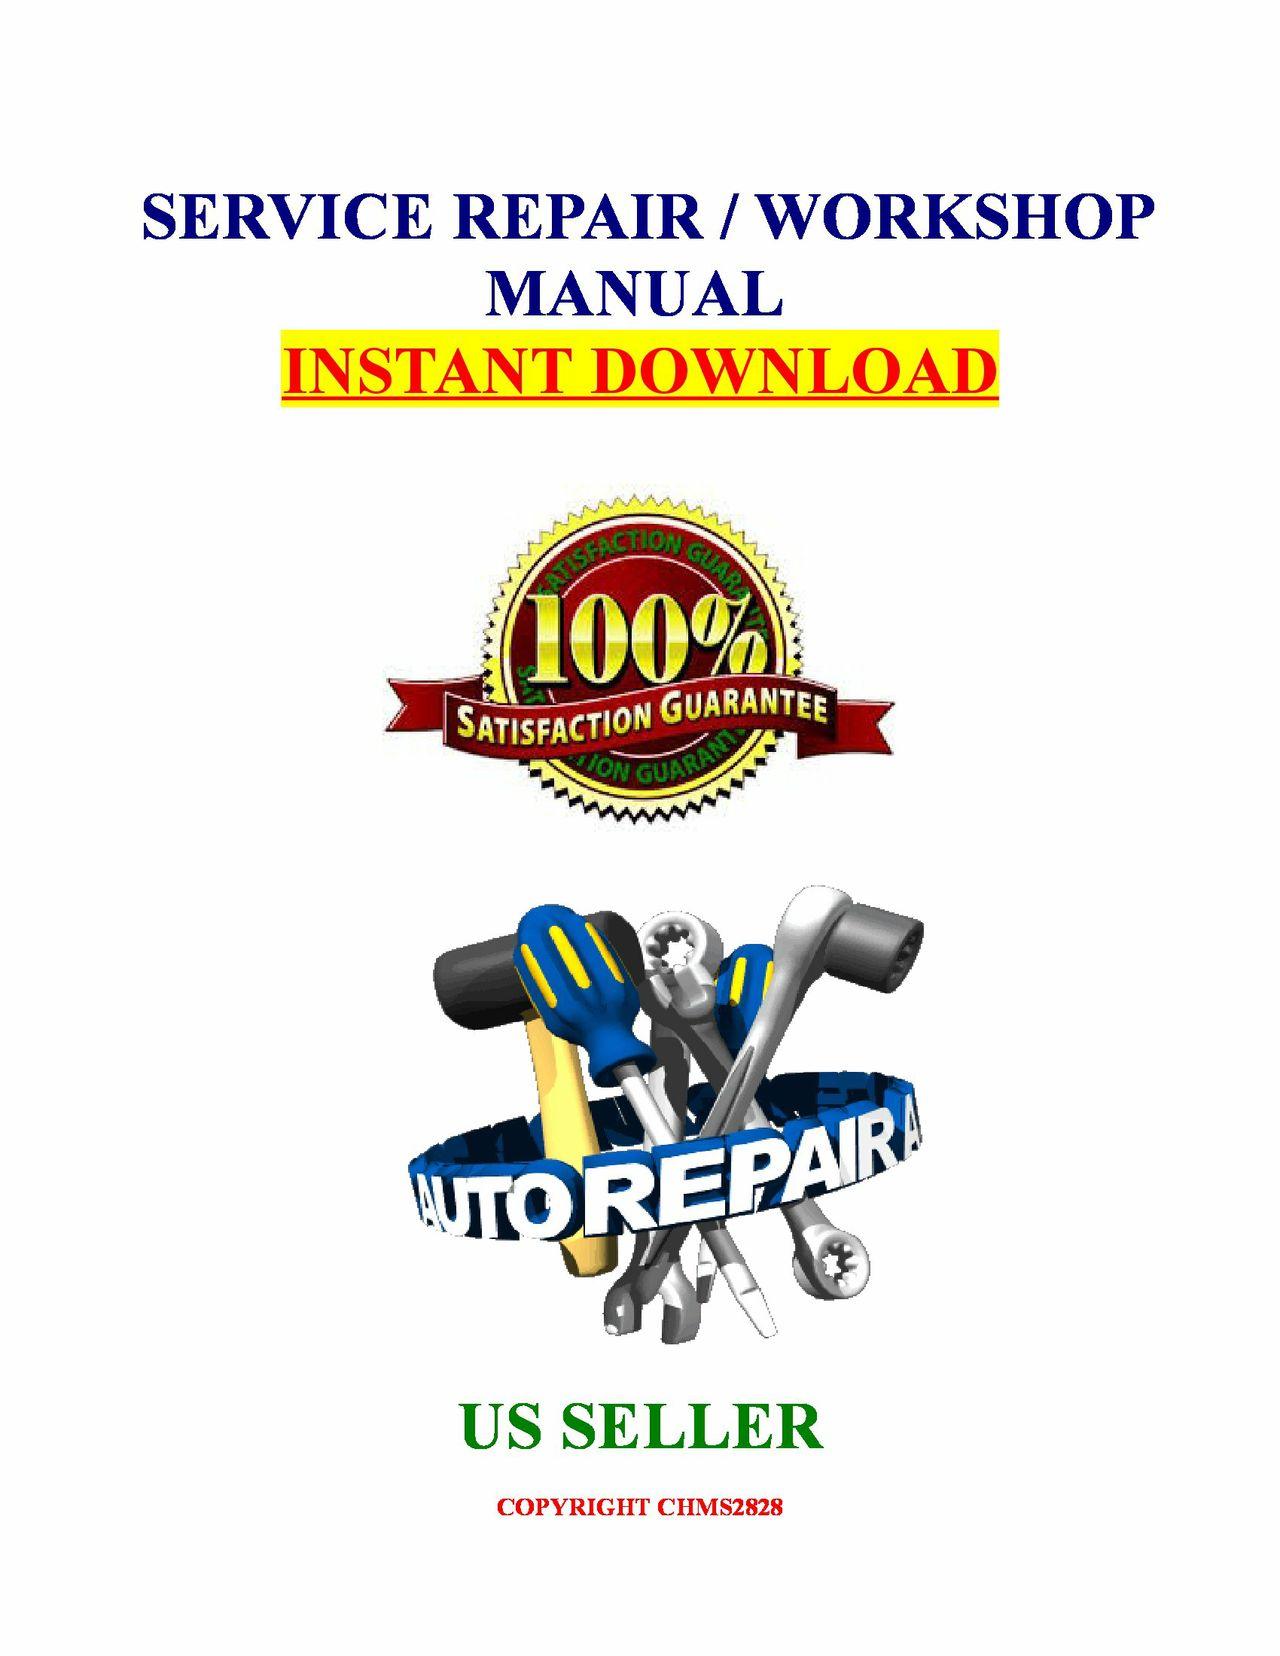 Bmw R1150Gs Motorcycle Service Repair Manual download